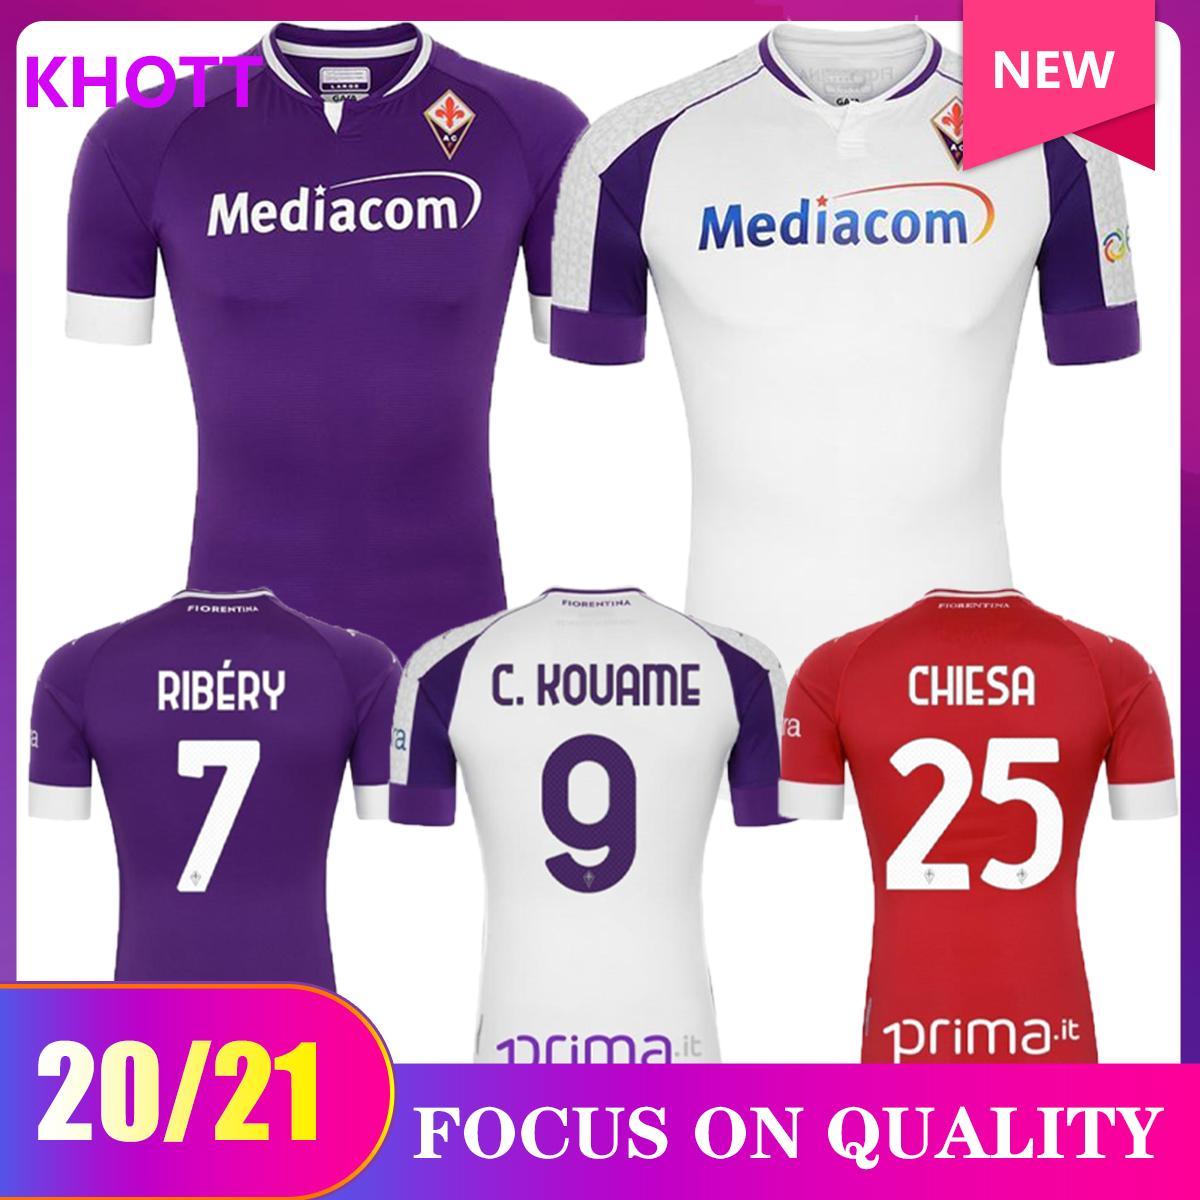 Thailandia 2021 2020 Firenze Ribery Jersey 20 21 Fiorentina Benassi 24 Biraghi 3 Chiesa 25 Simeone 9 Ribery 7 Home Soccer Jersey